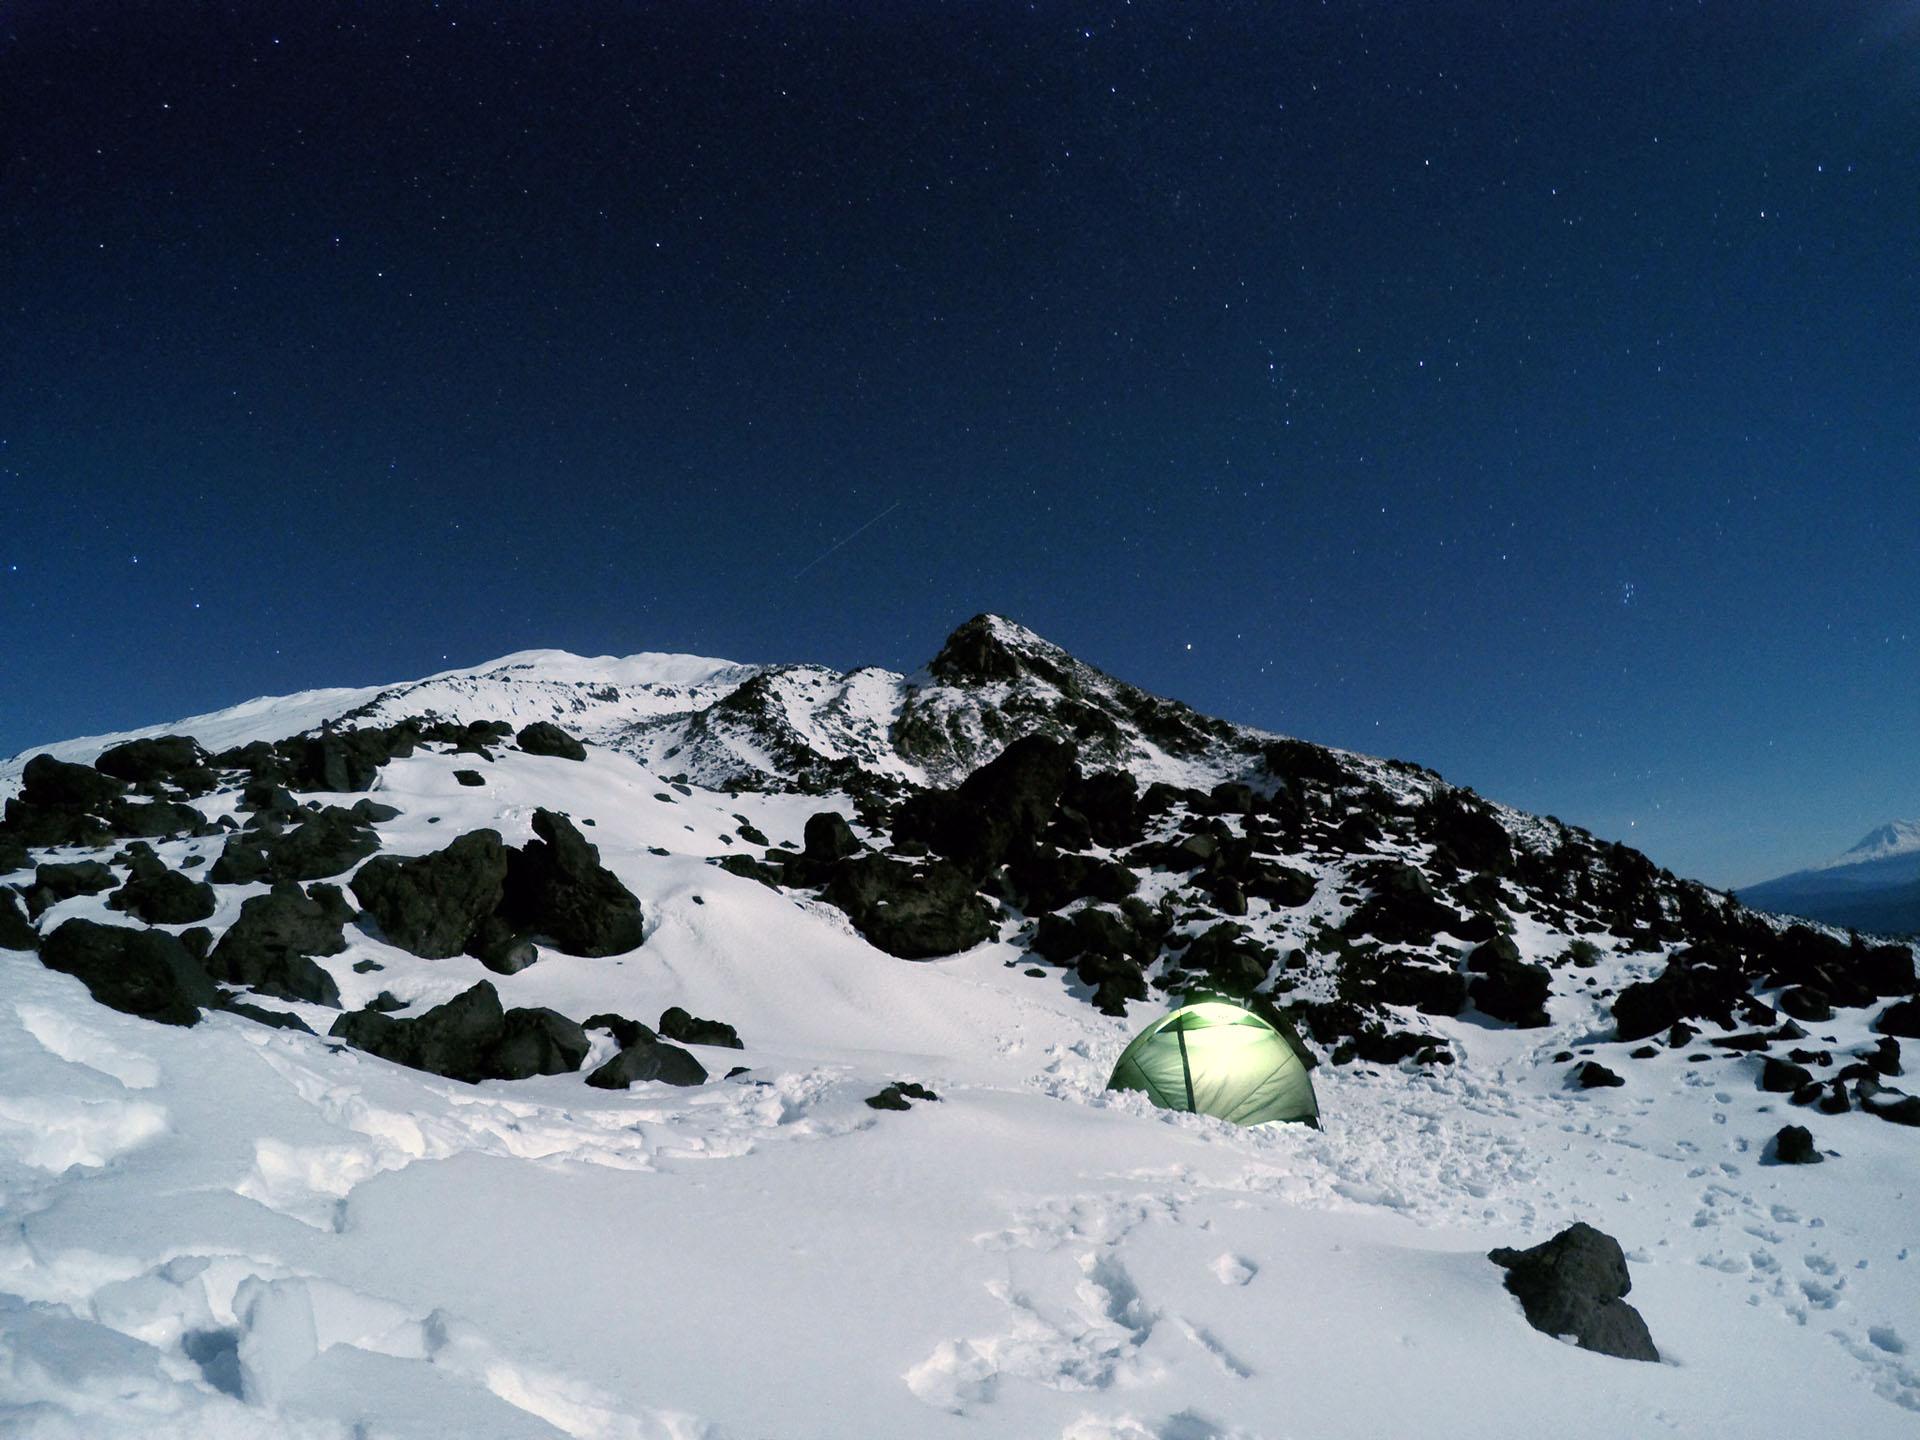 Monitor Ridge - Mt. St. Helens - Nov 2015